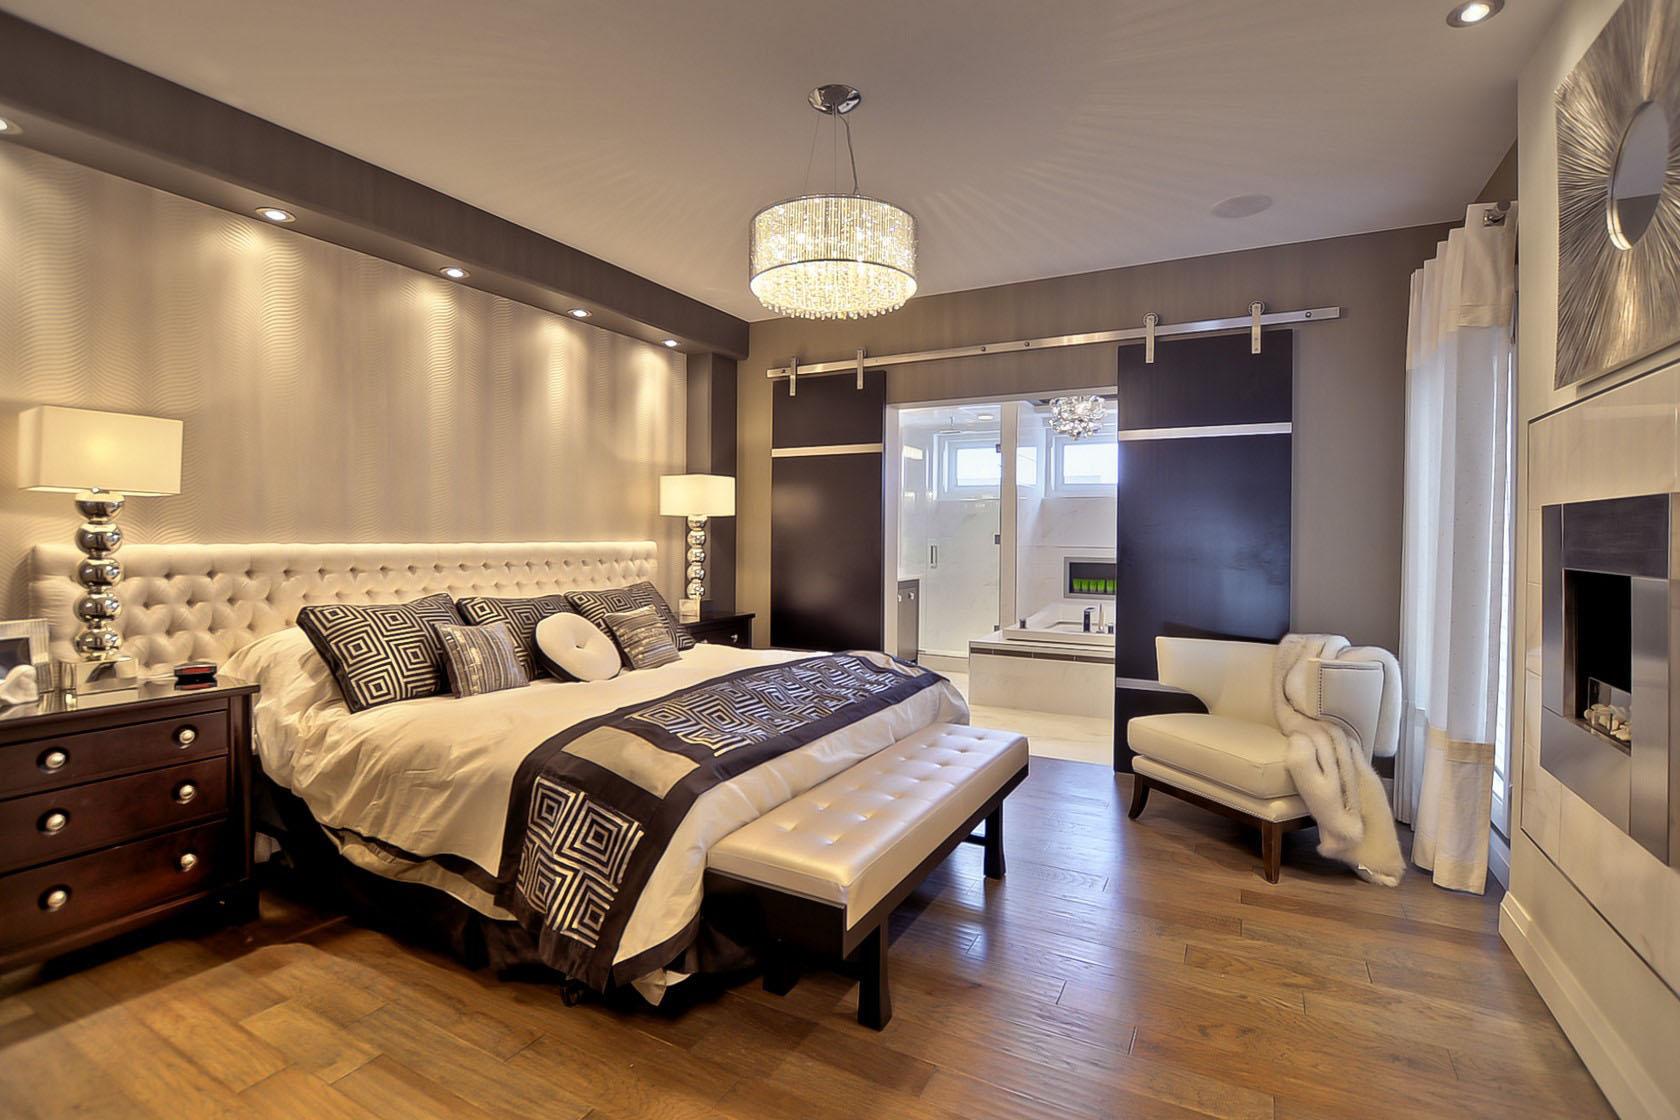 Contemporary Custom Dream Home In Saskatoon With Inspiring Interior Decor  iDesignArch